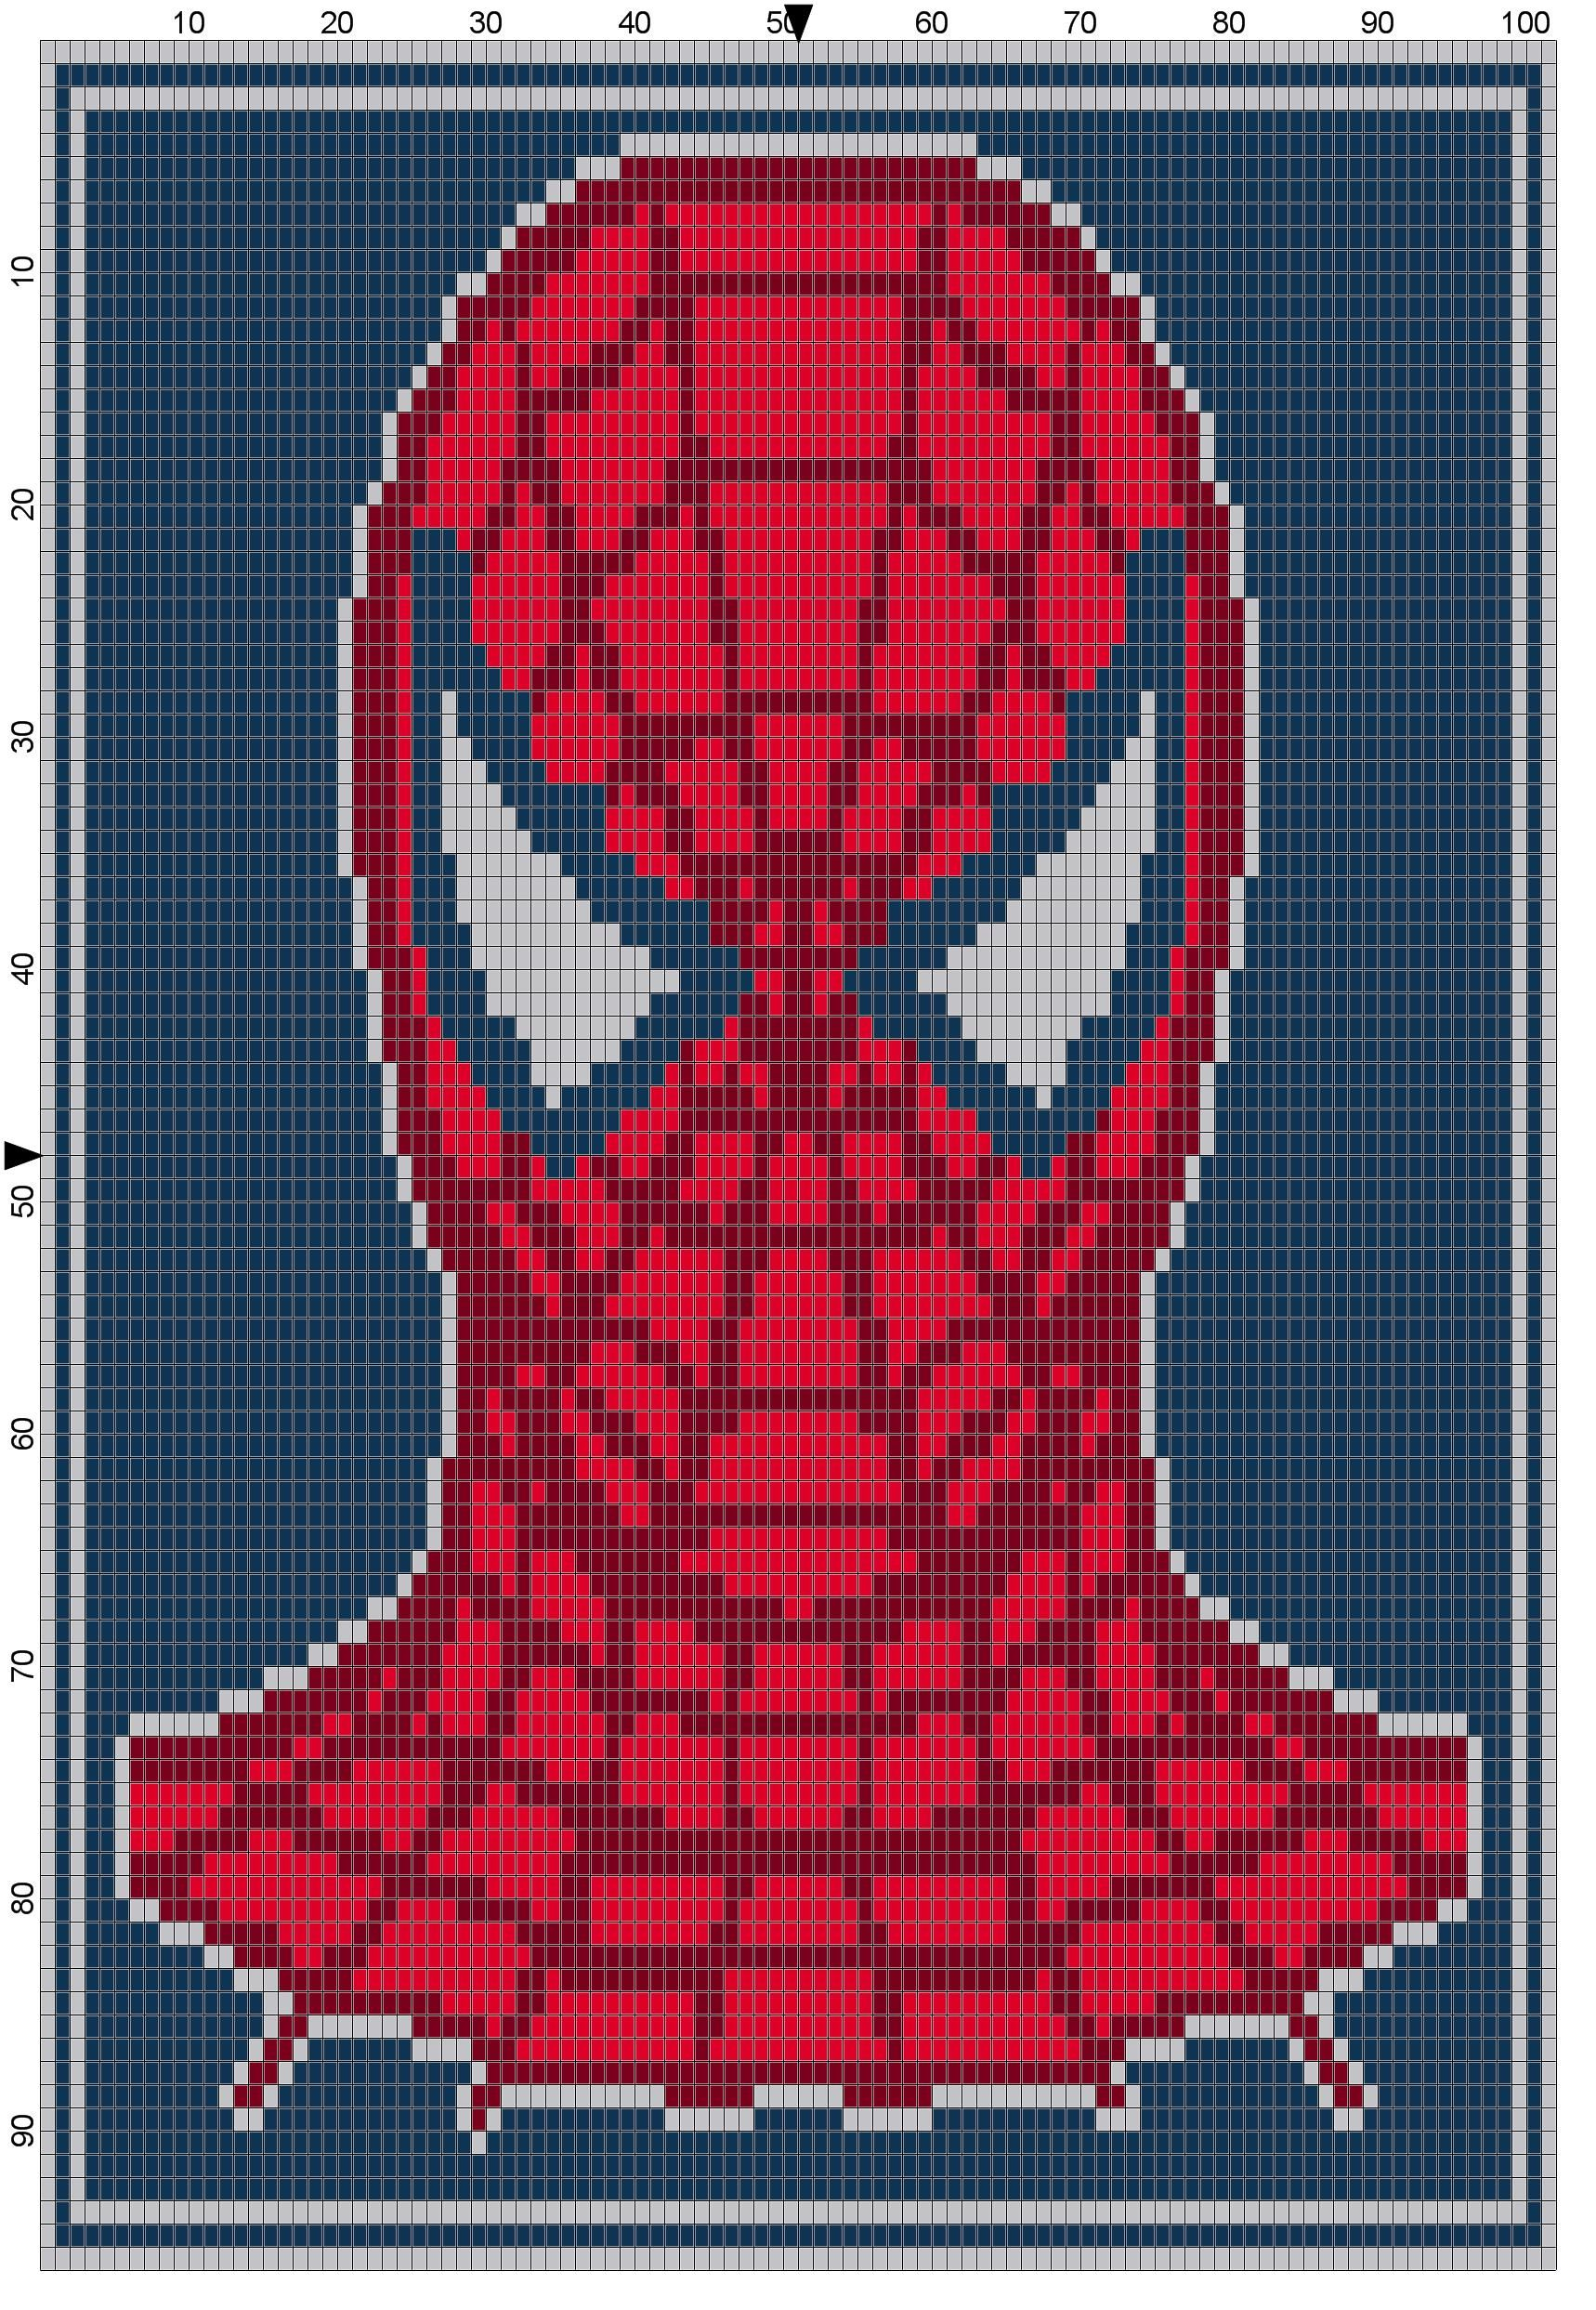 Spiderman Headshot Comics Crochet Square Blanket